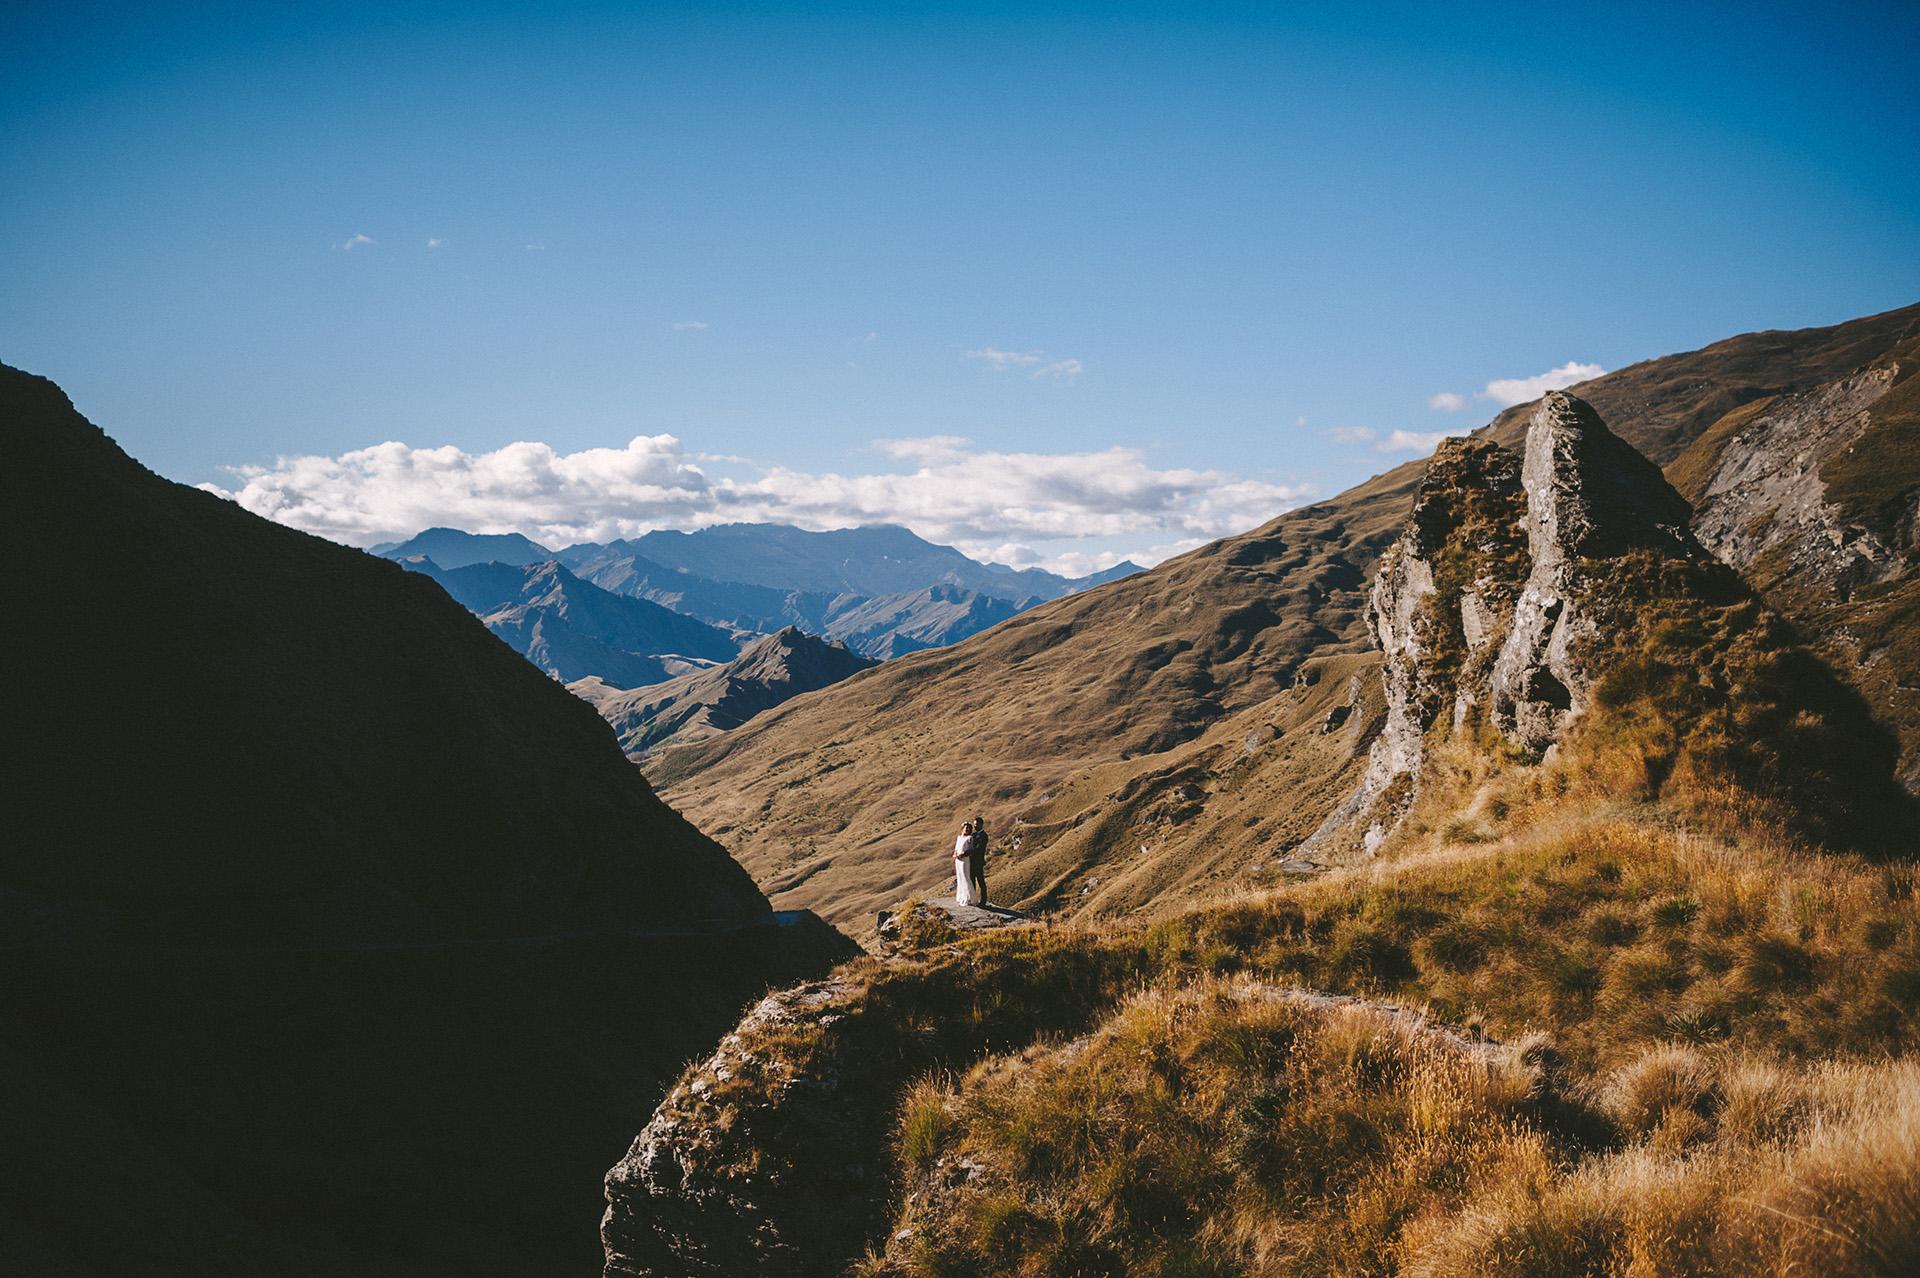 gratuitous New Zealand landscape awesomeness